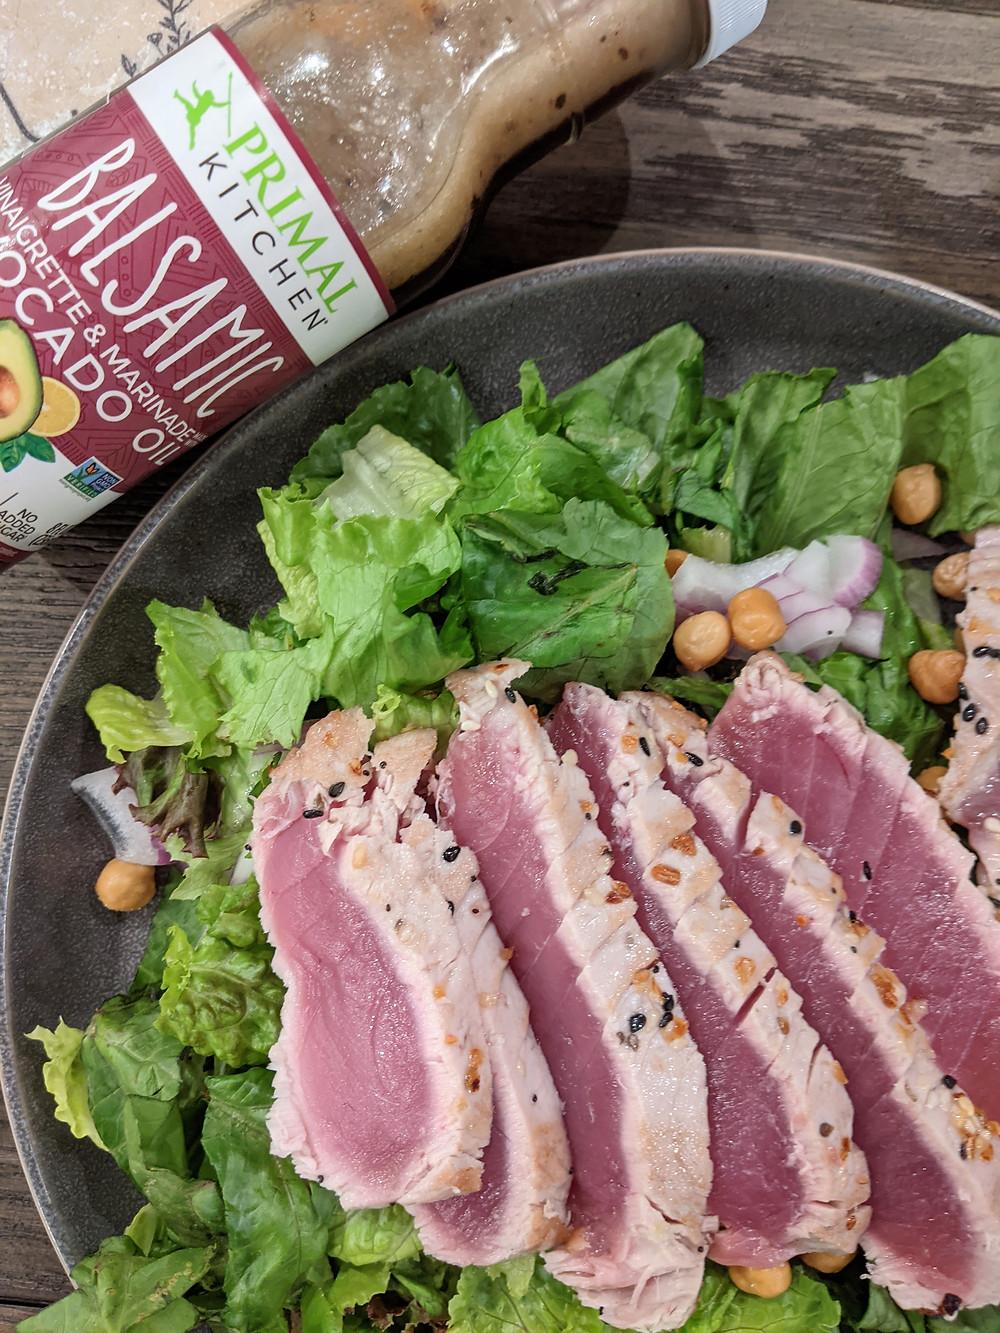 7-Day Food Allergy-Friendly Diet Plan to Kickstart Your Healthy Habits - Amanda MacGregor